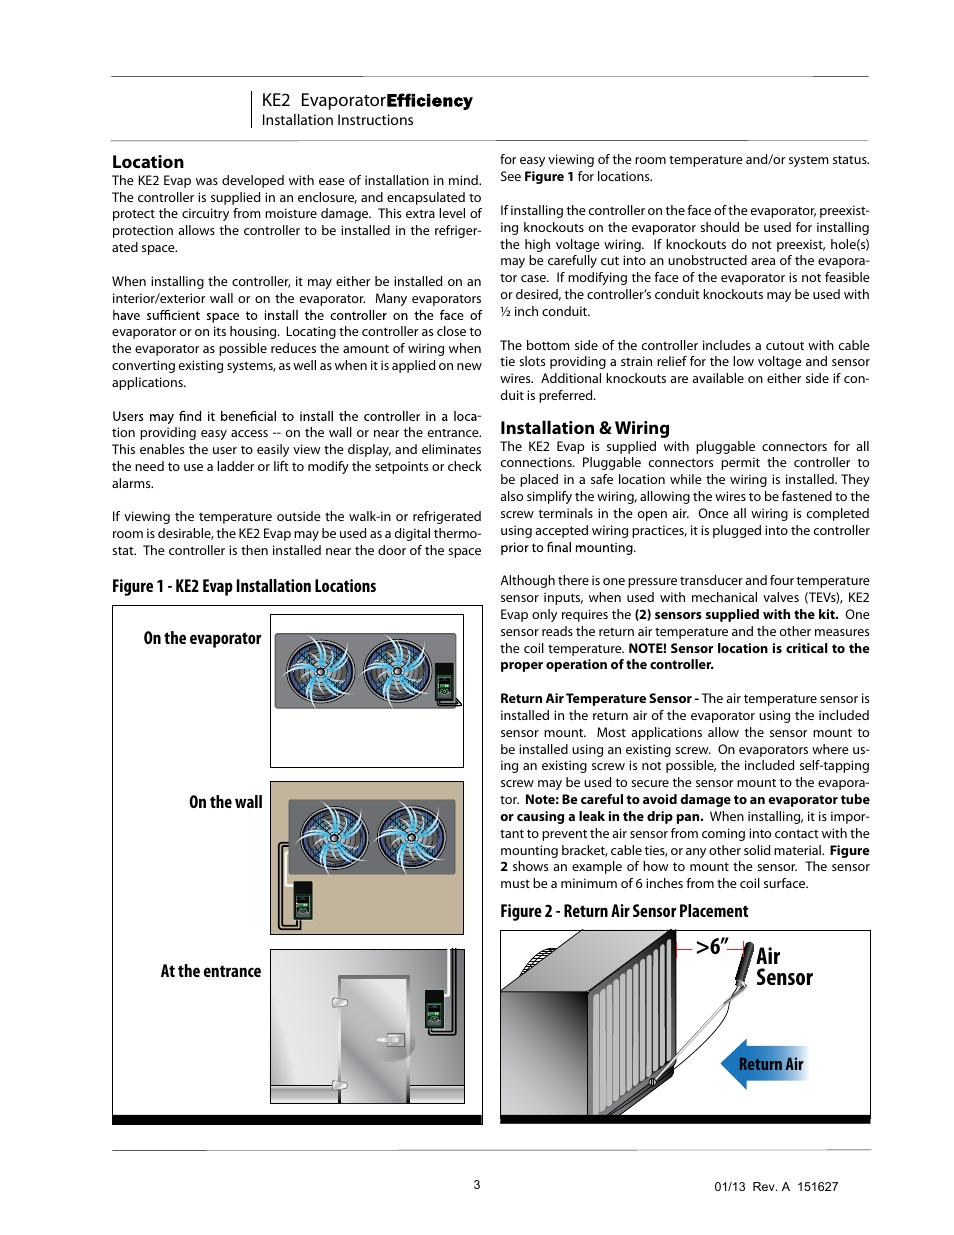 Air sensor >6, Ke2 evaporator, Installation & wiring | Nor-Lake